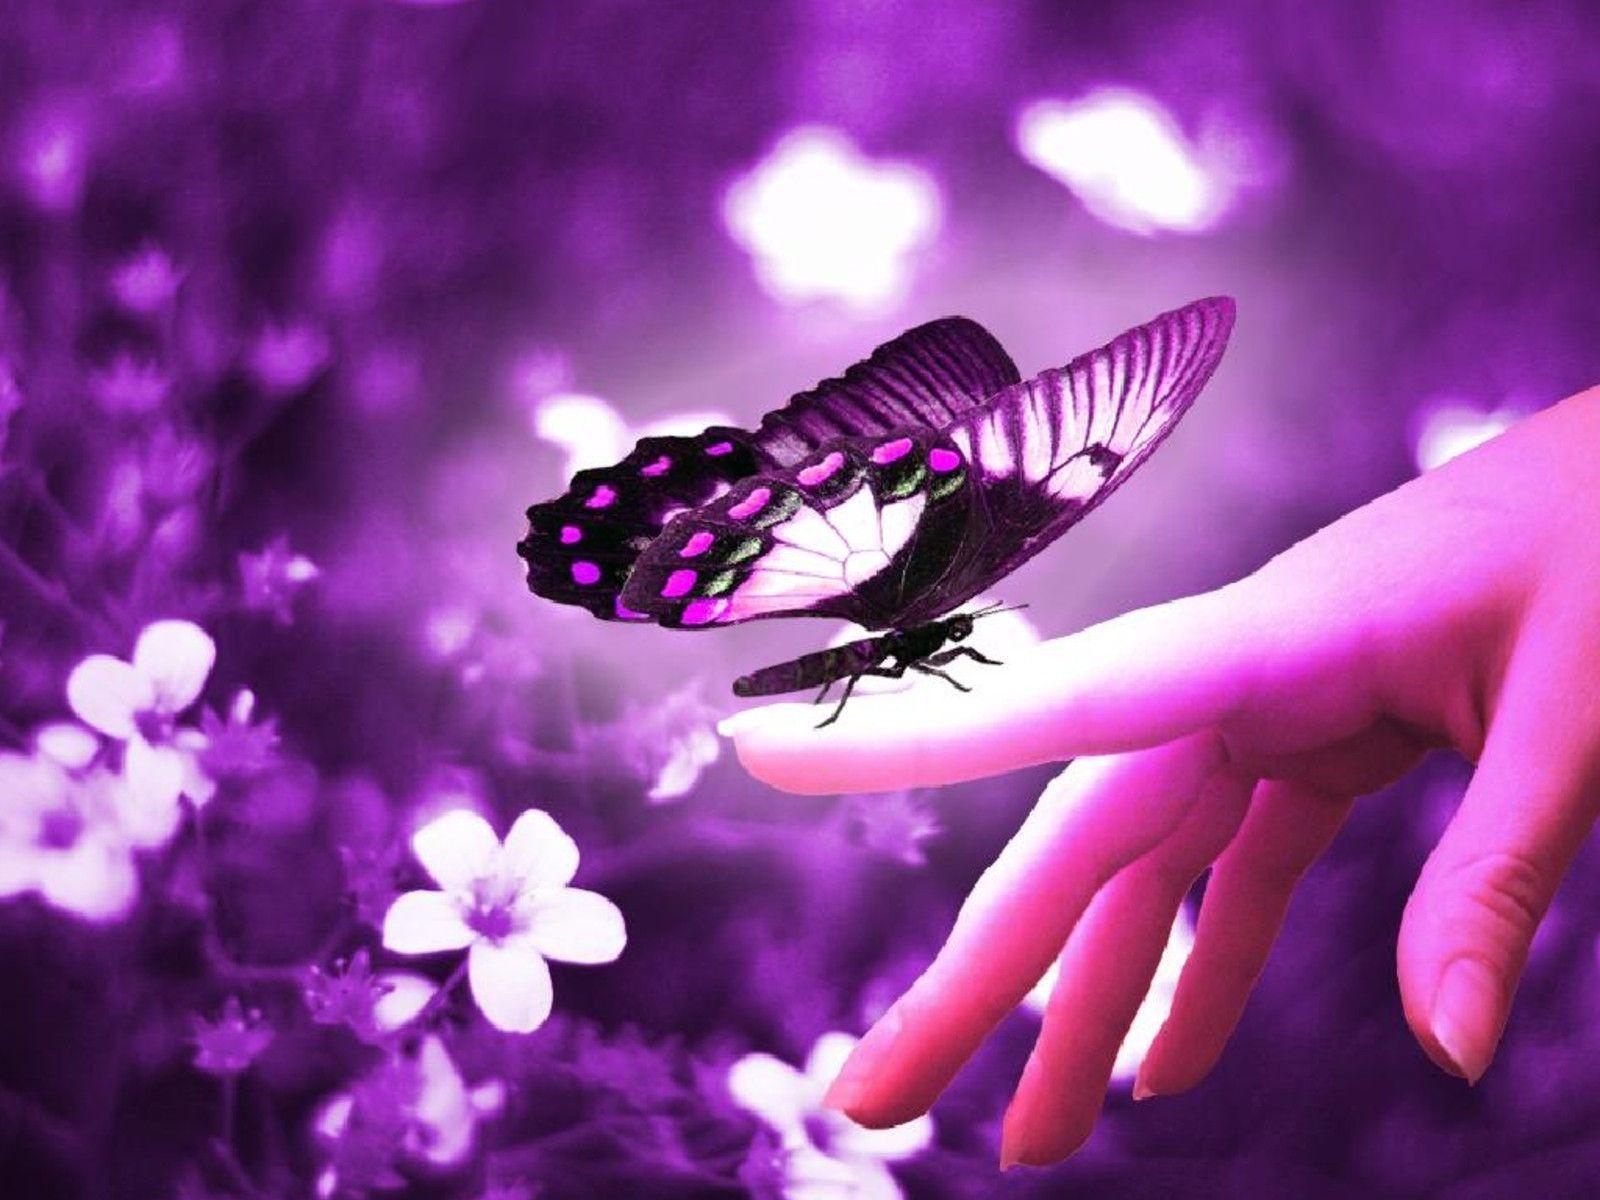 Free Butterfly Wallpaper Wallpapers Backgrounds Desktop